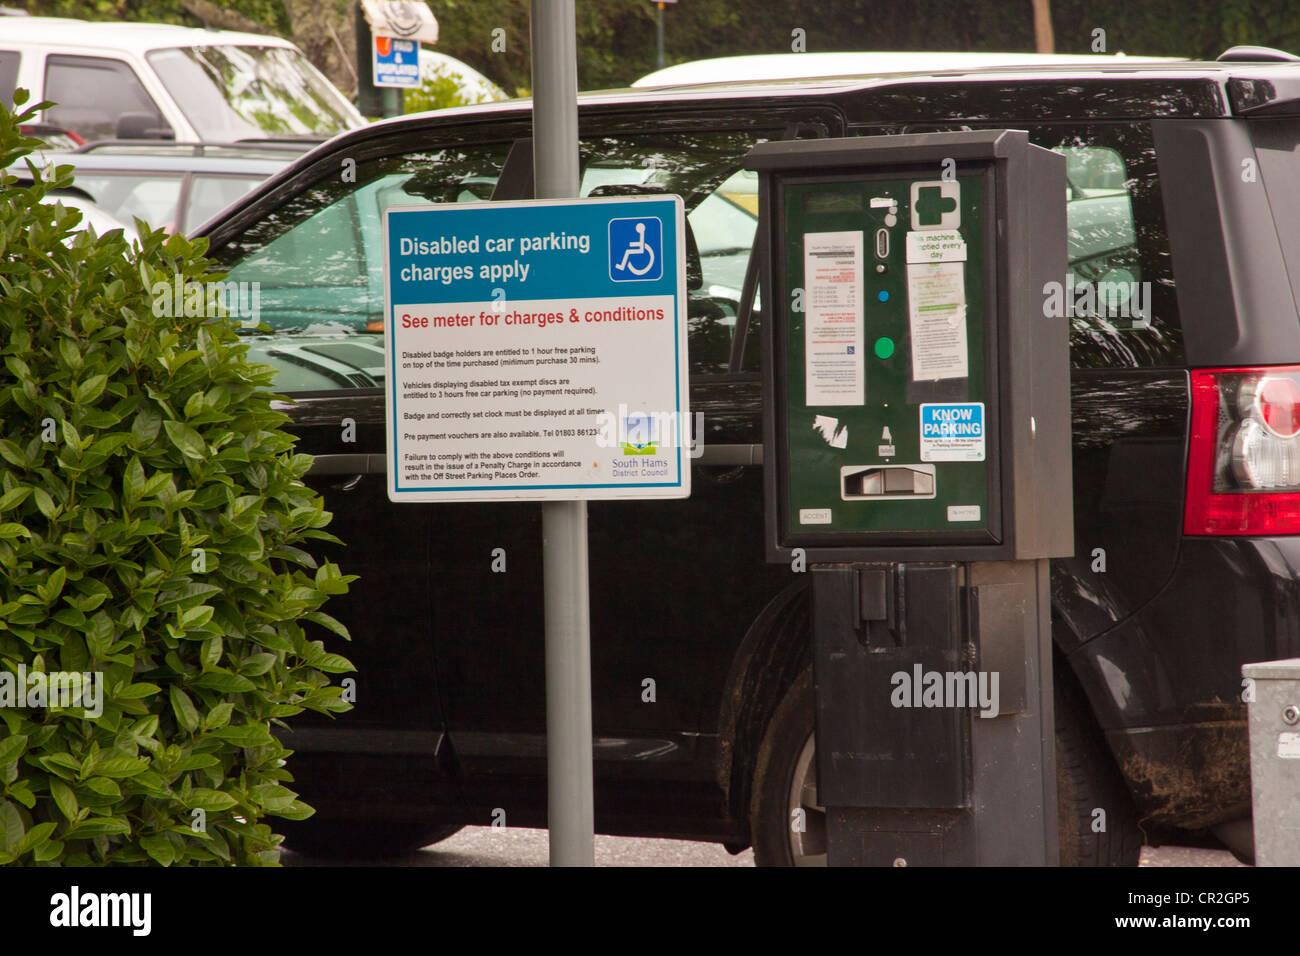 Disabled car parking charges sign in town center car park in Totnes, Devon, UK. - Stock Image